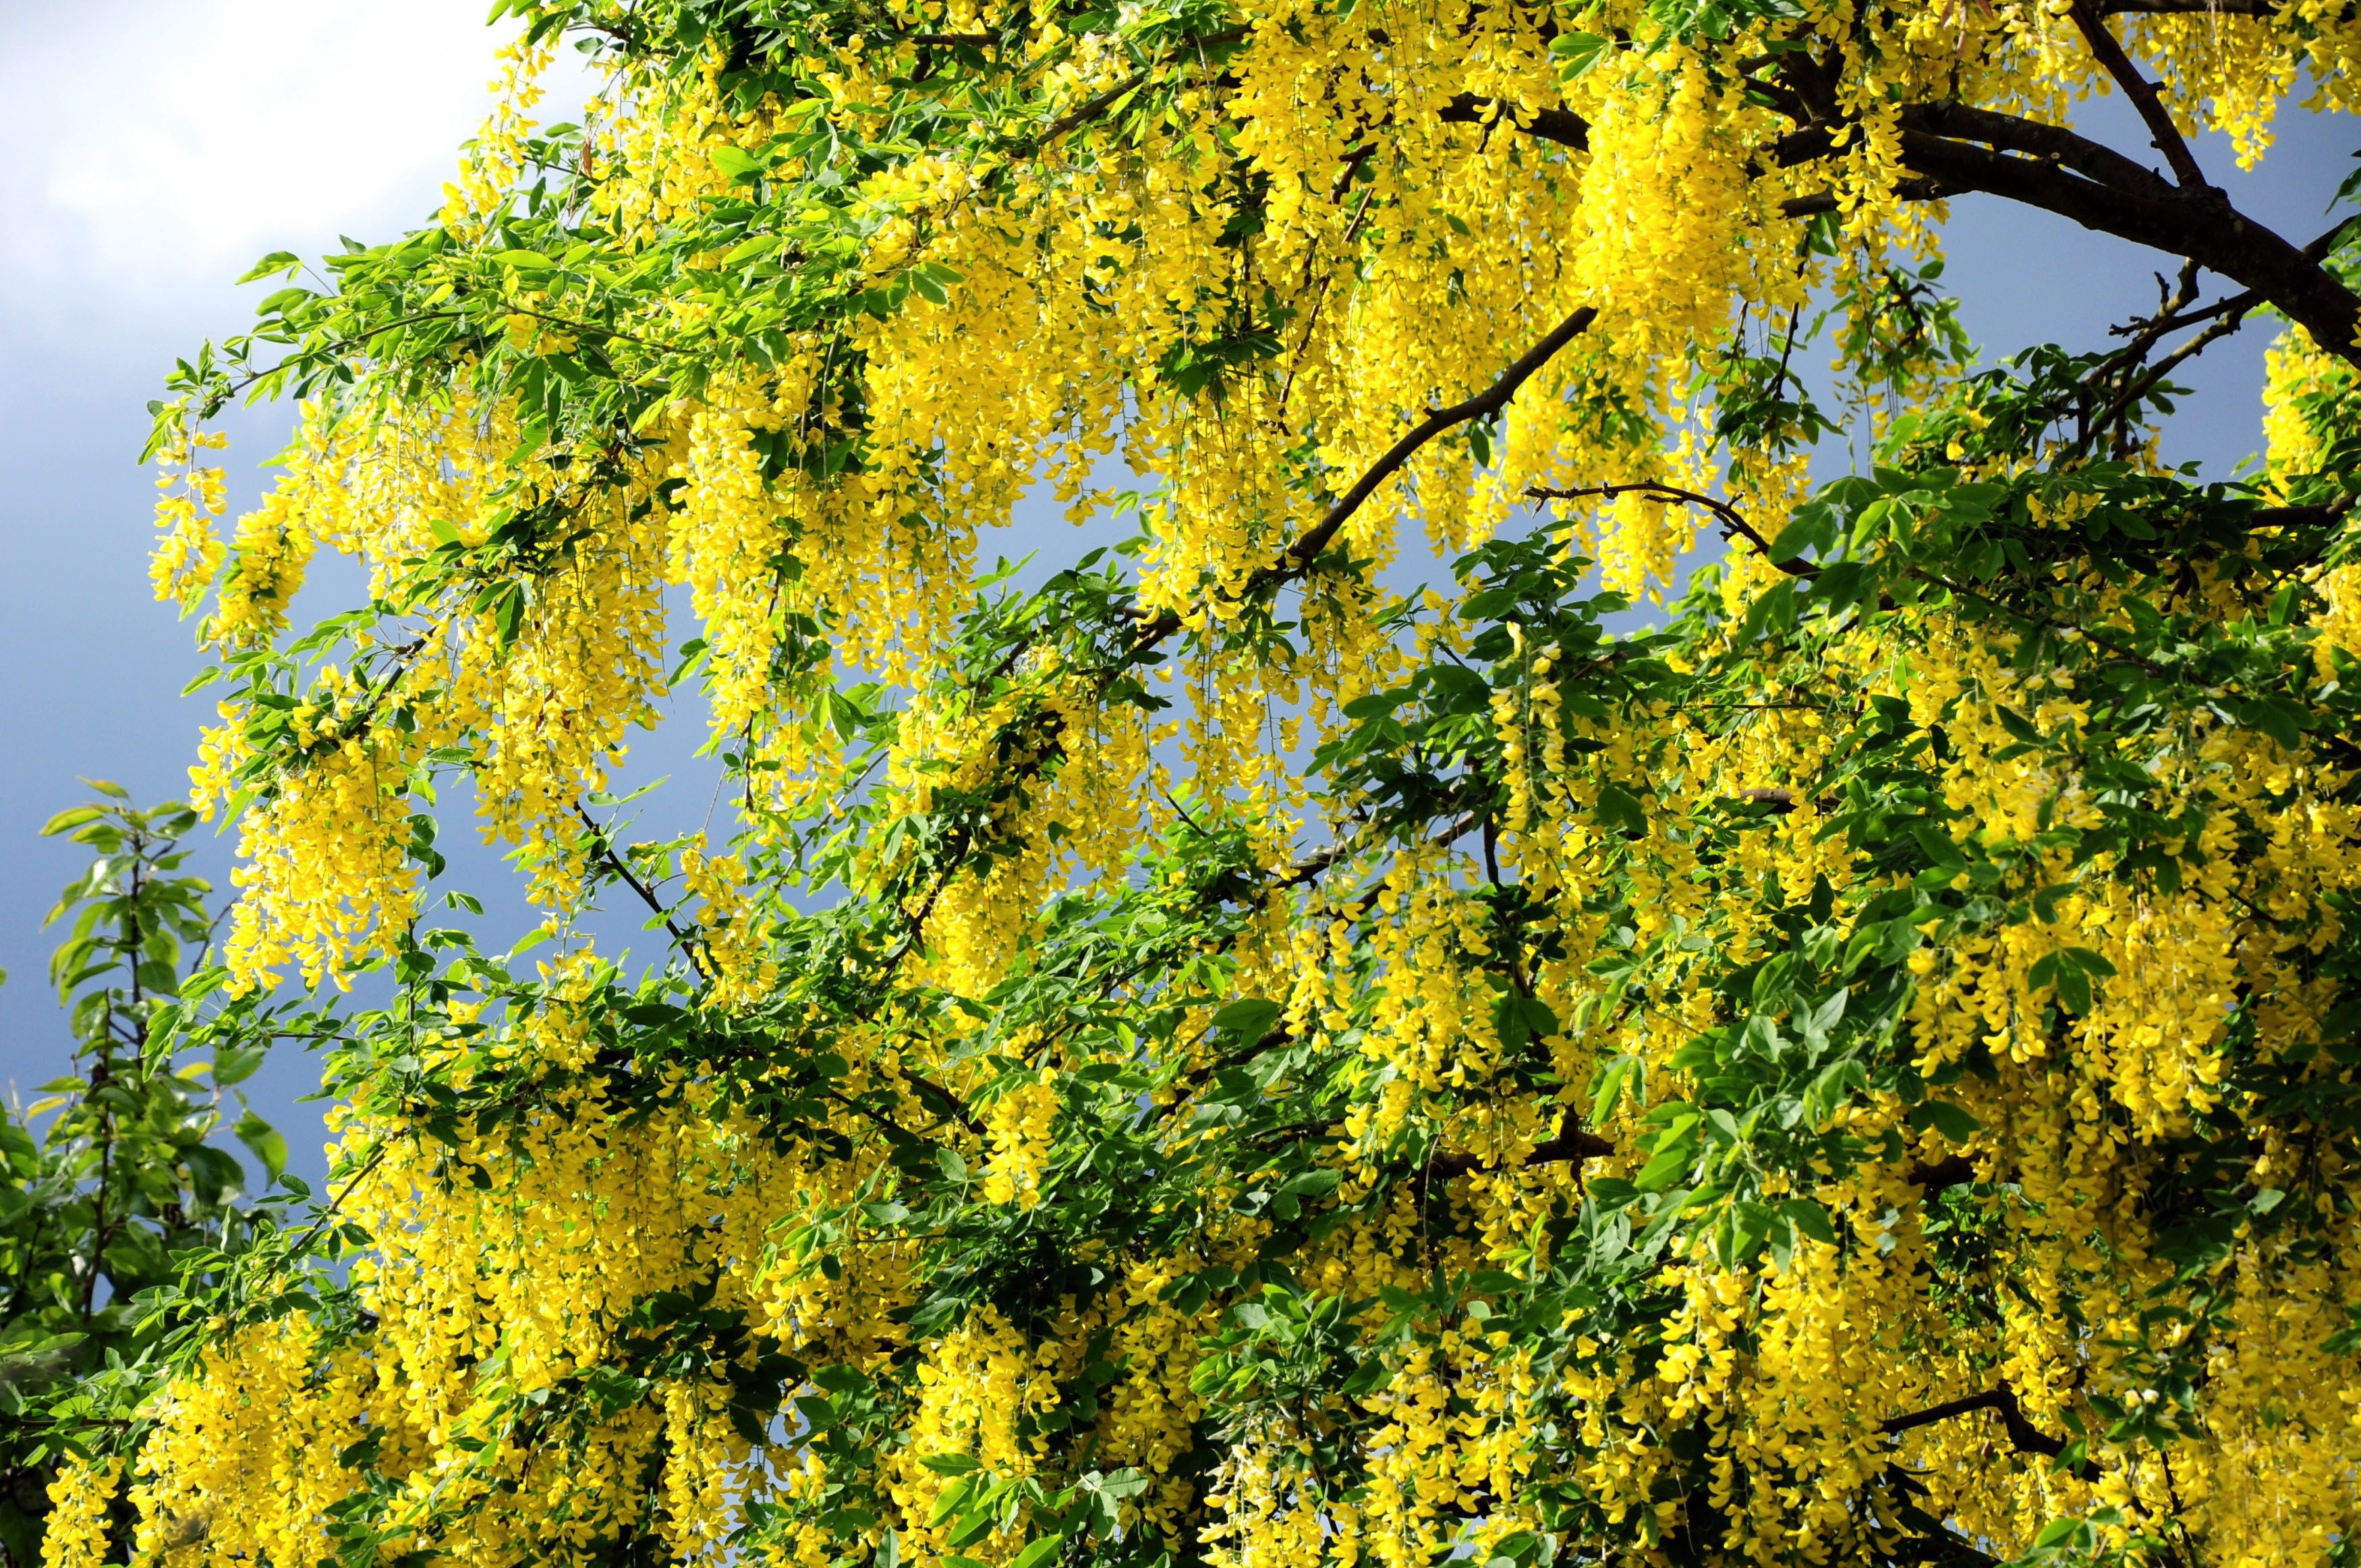 Natureseasonsspringbeautifulfloweringspringtree068240